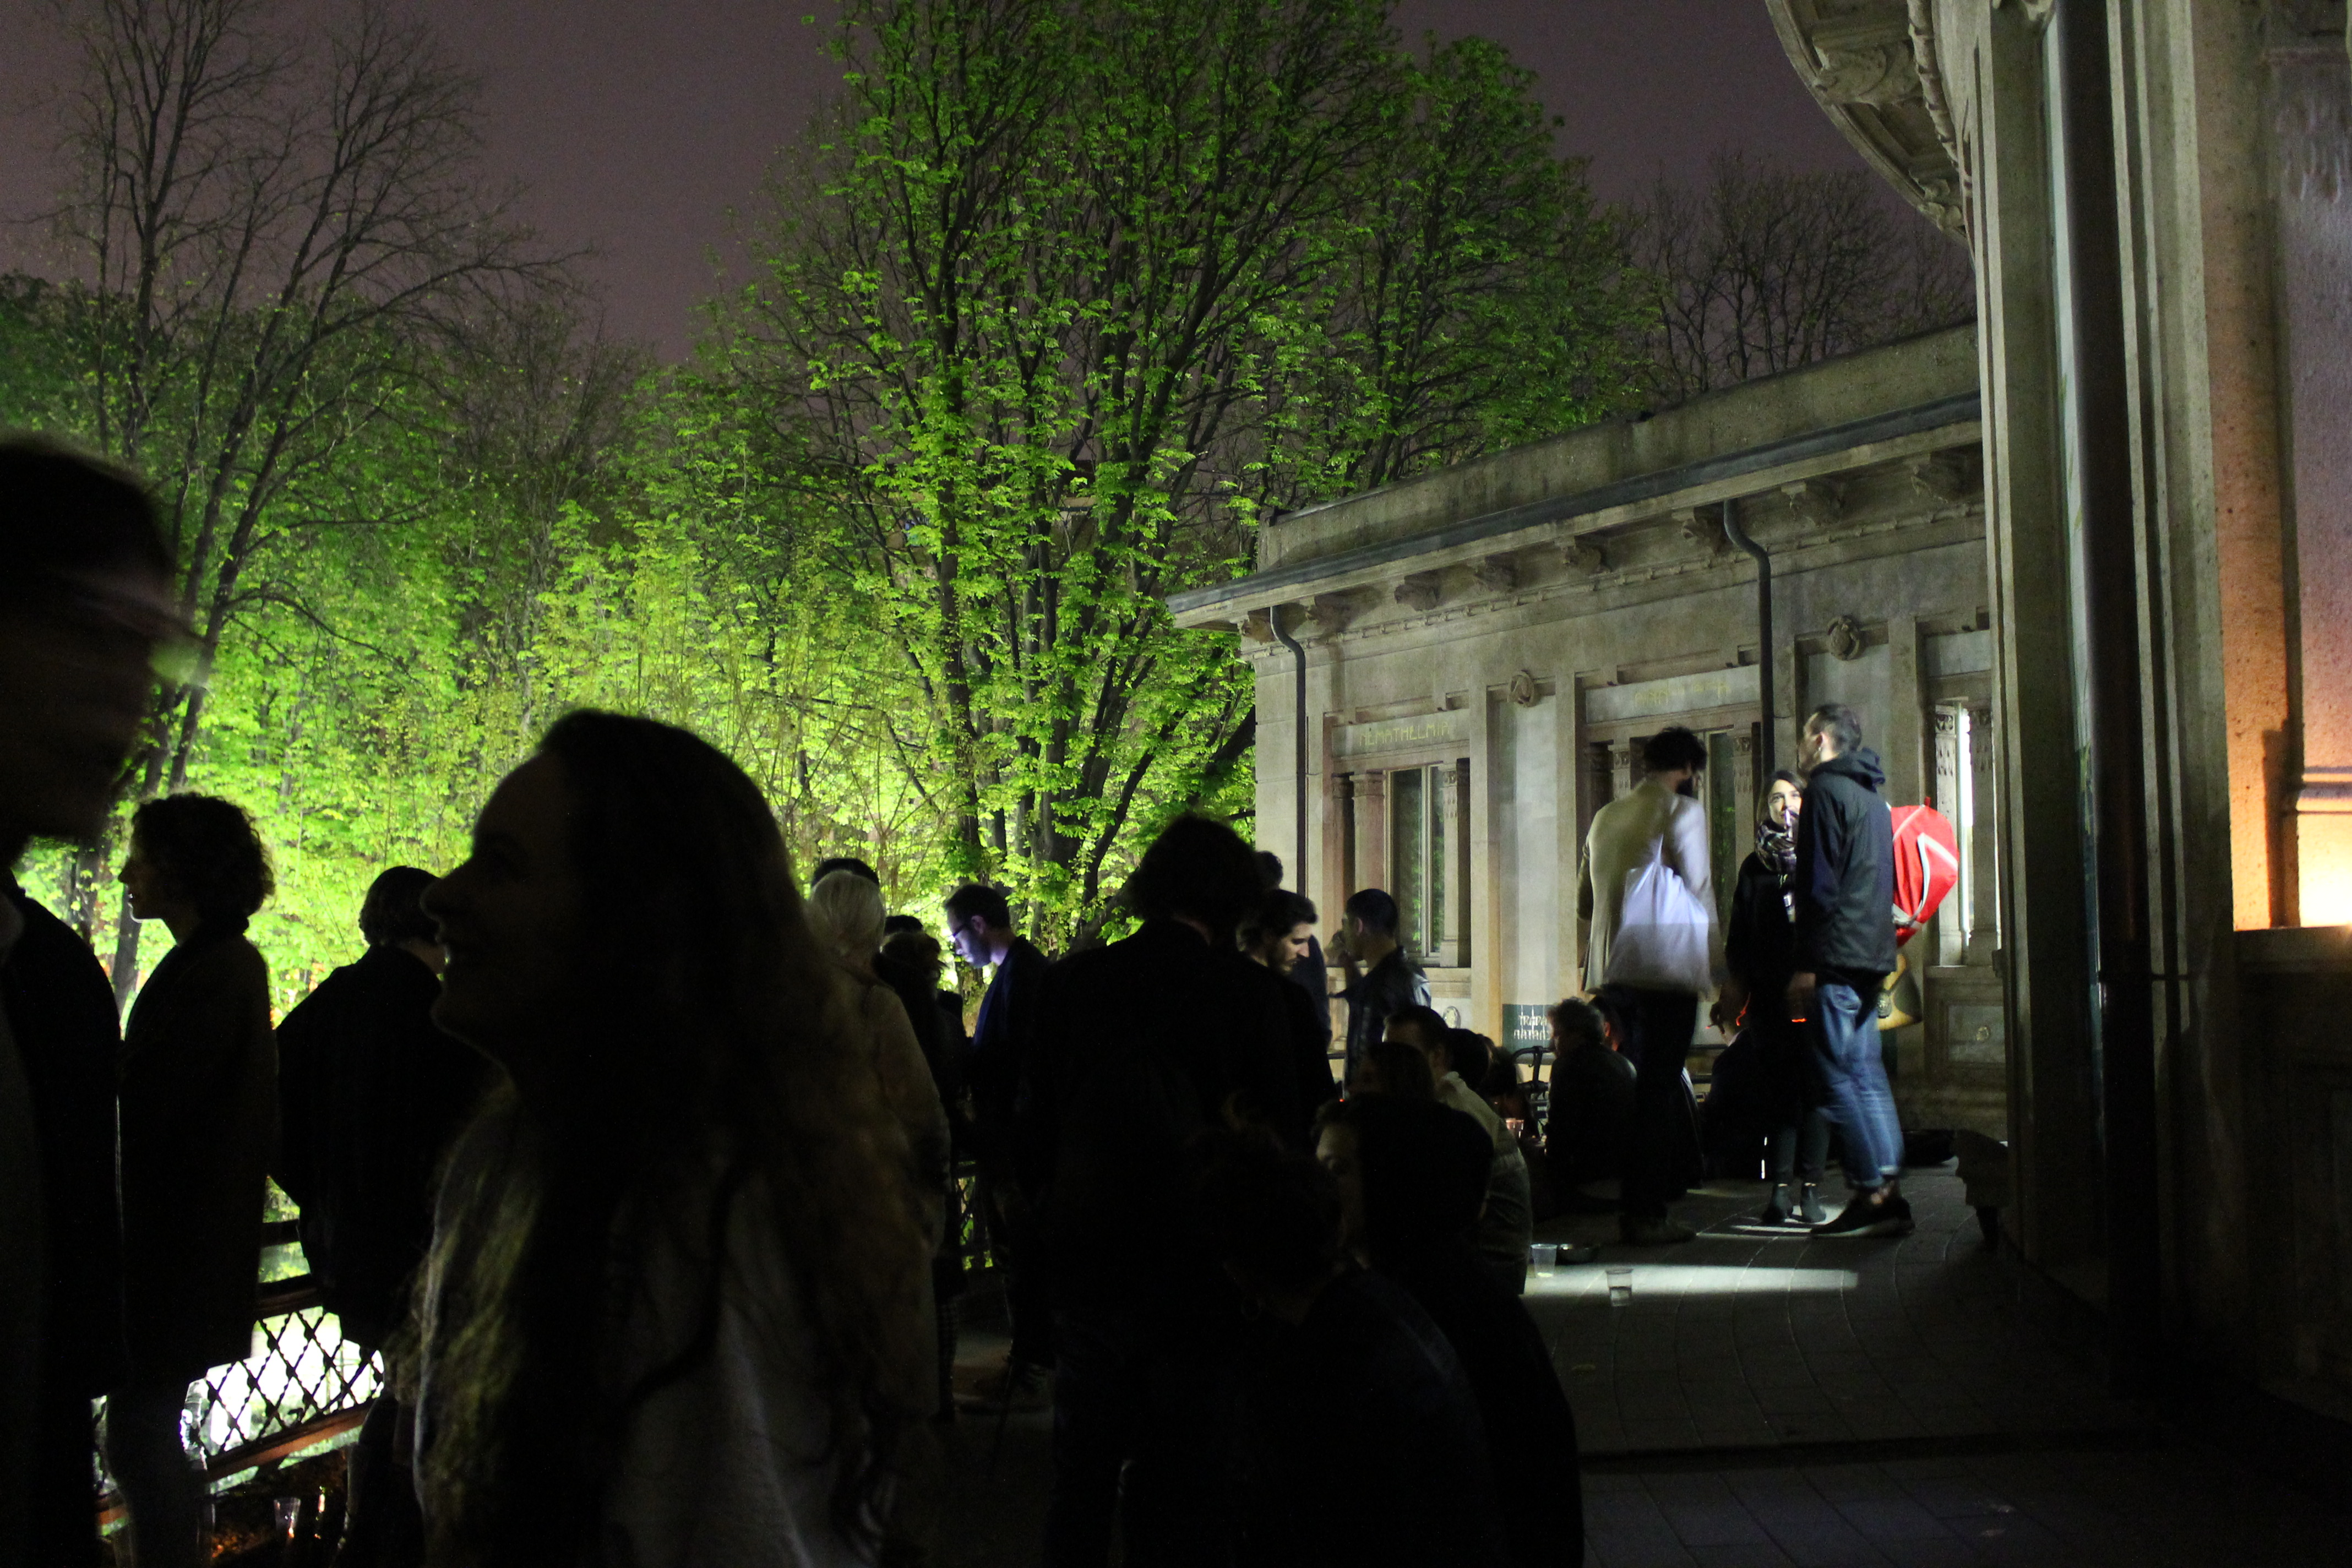 The Spring Night, 2014 (Acquario di Milano), Photo: Valentina Bigaran.